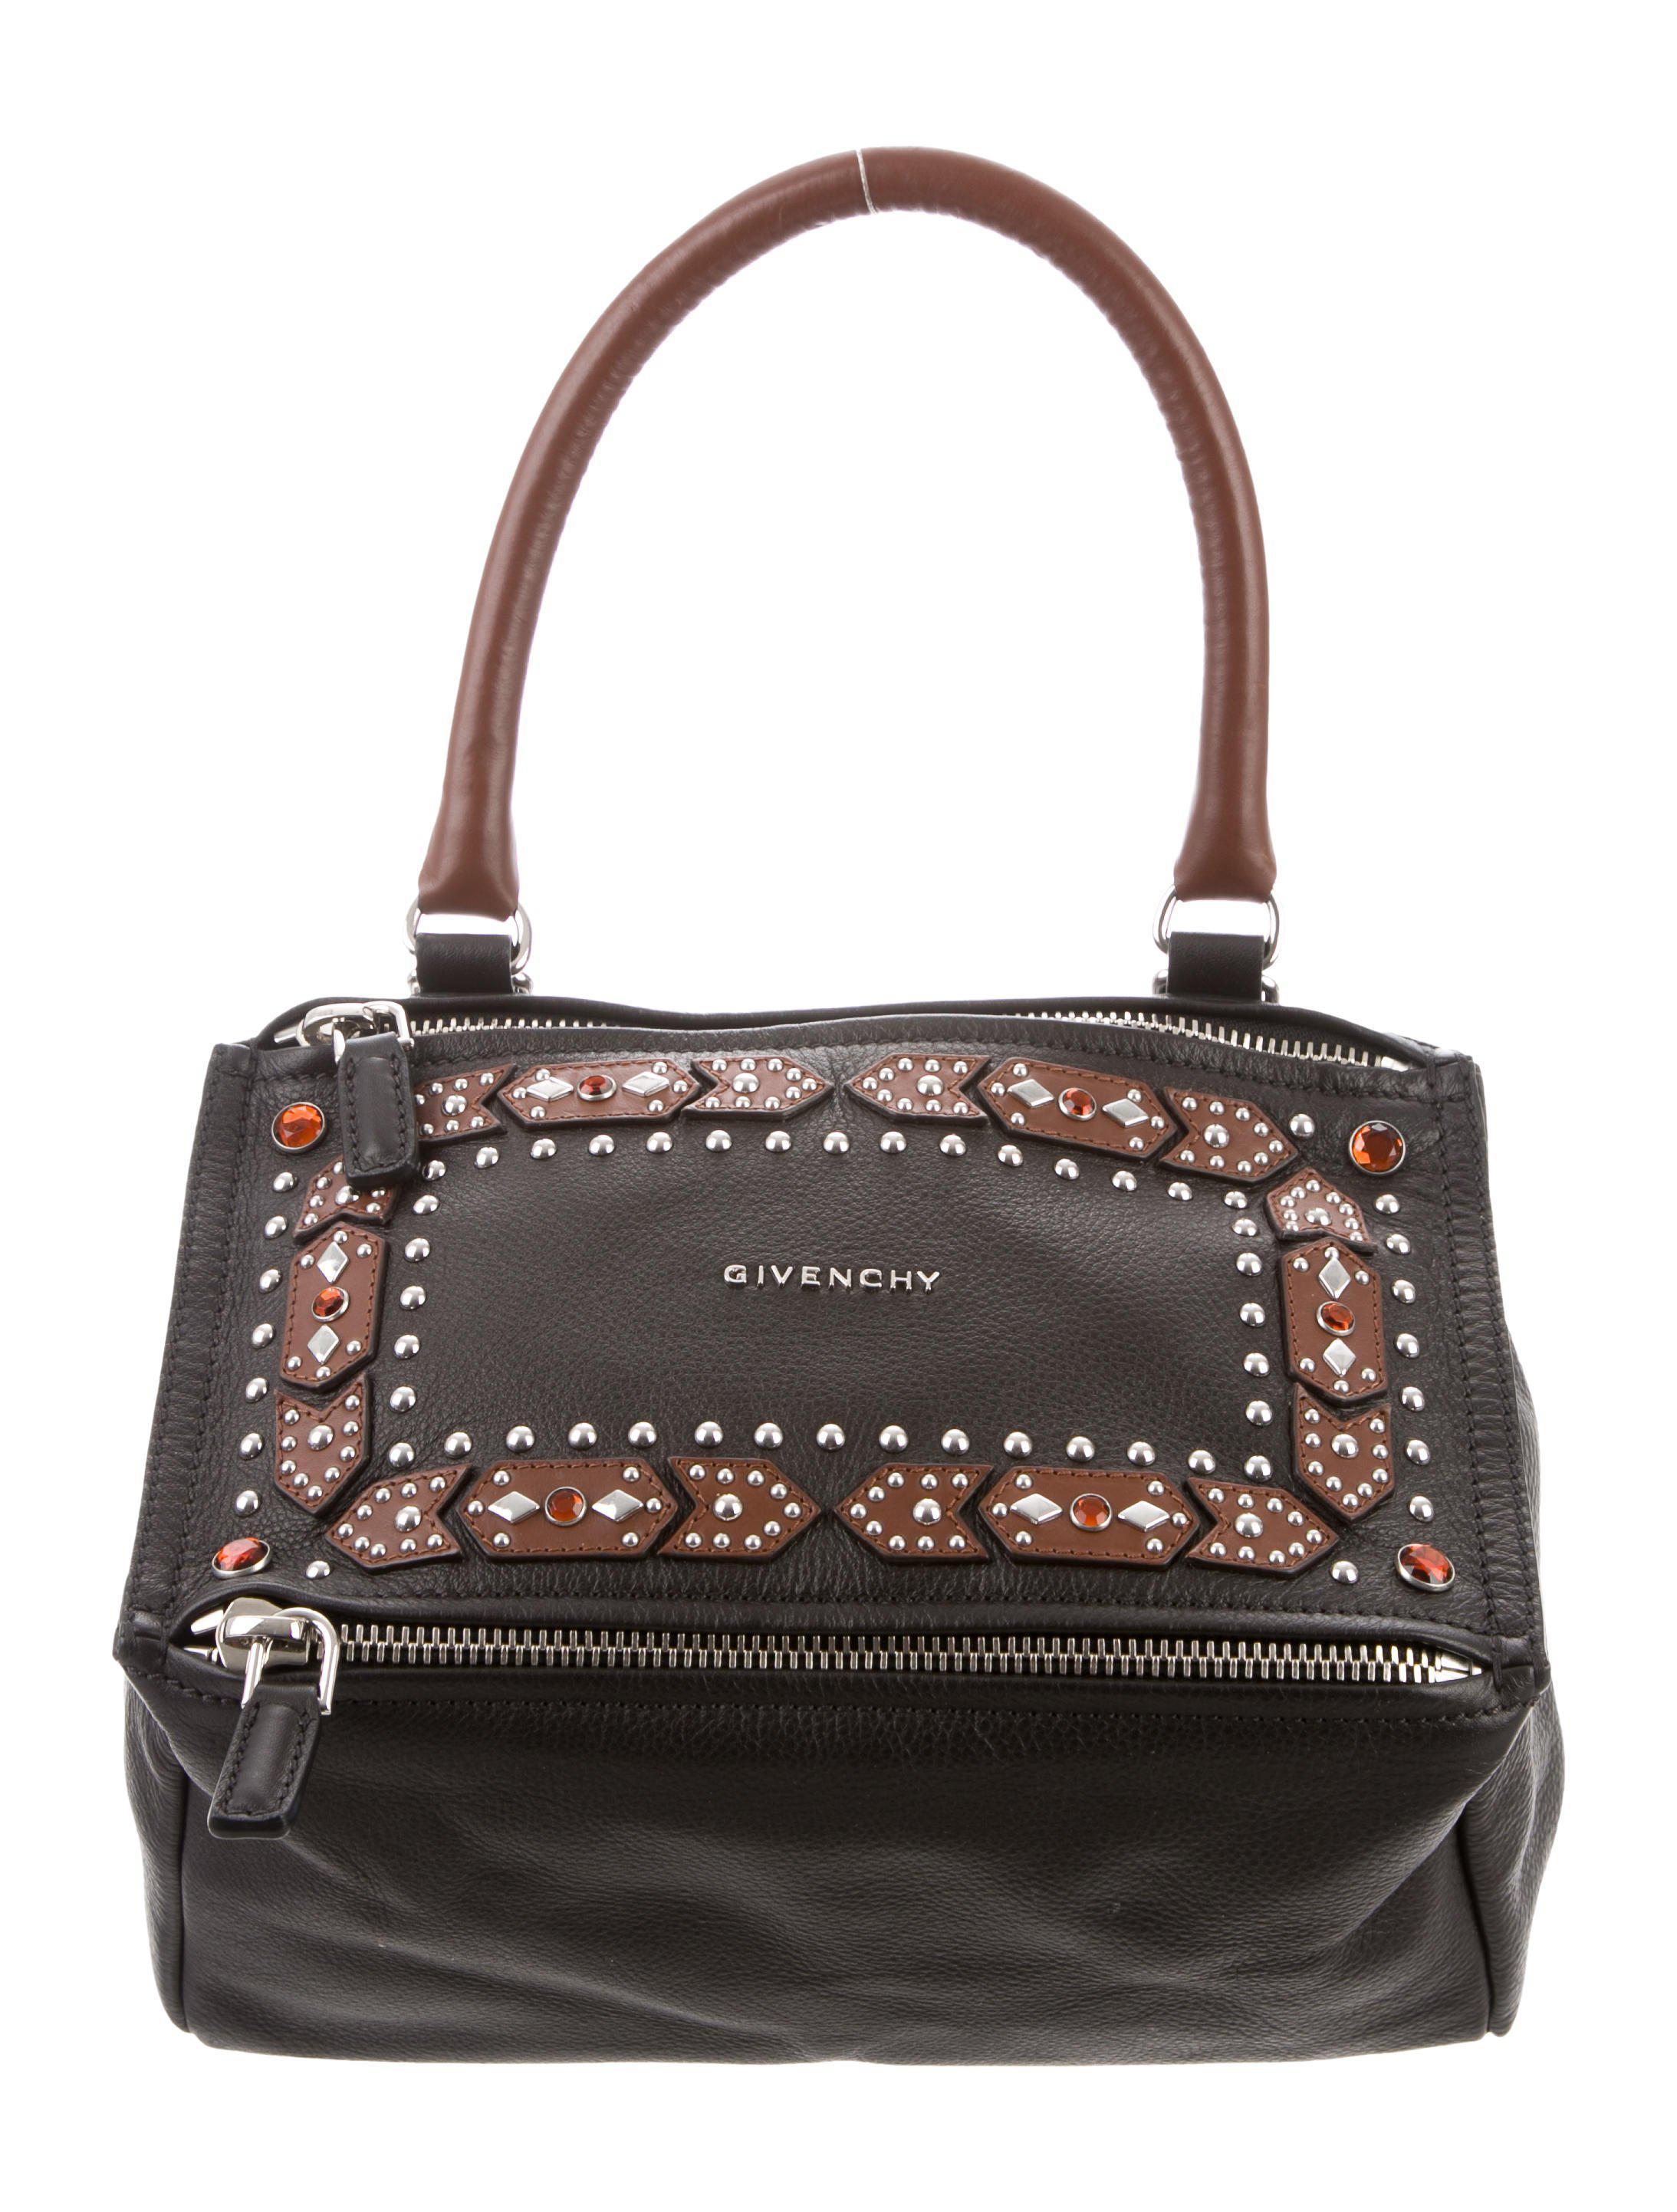 e07e56ab26 Lyst - Givenchy Pandora Studded Satchel Black in Metallic